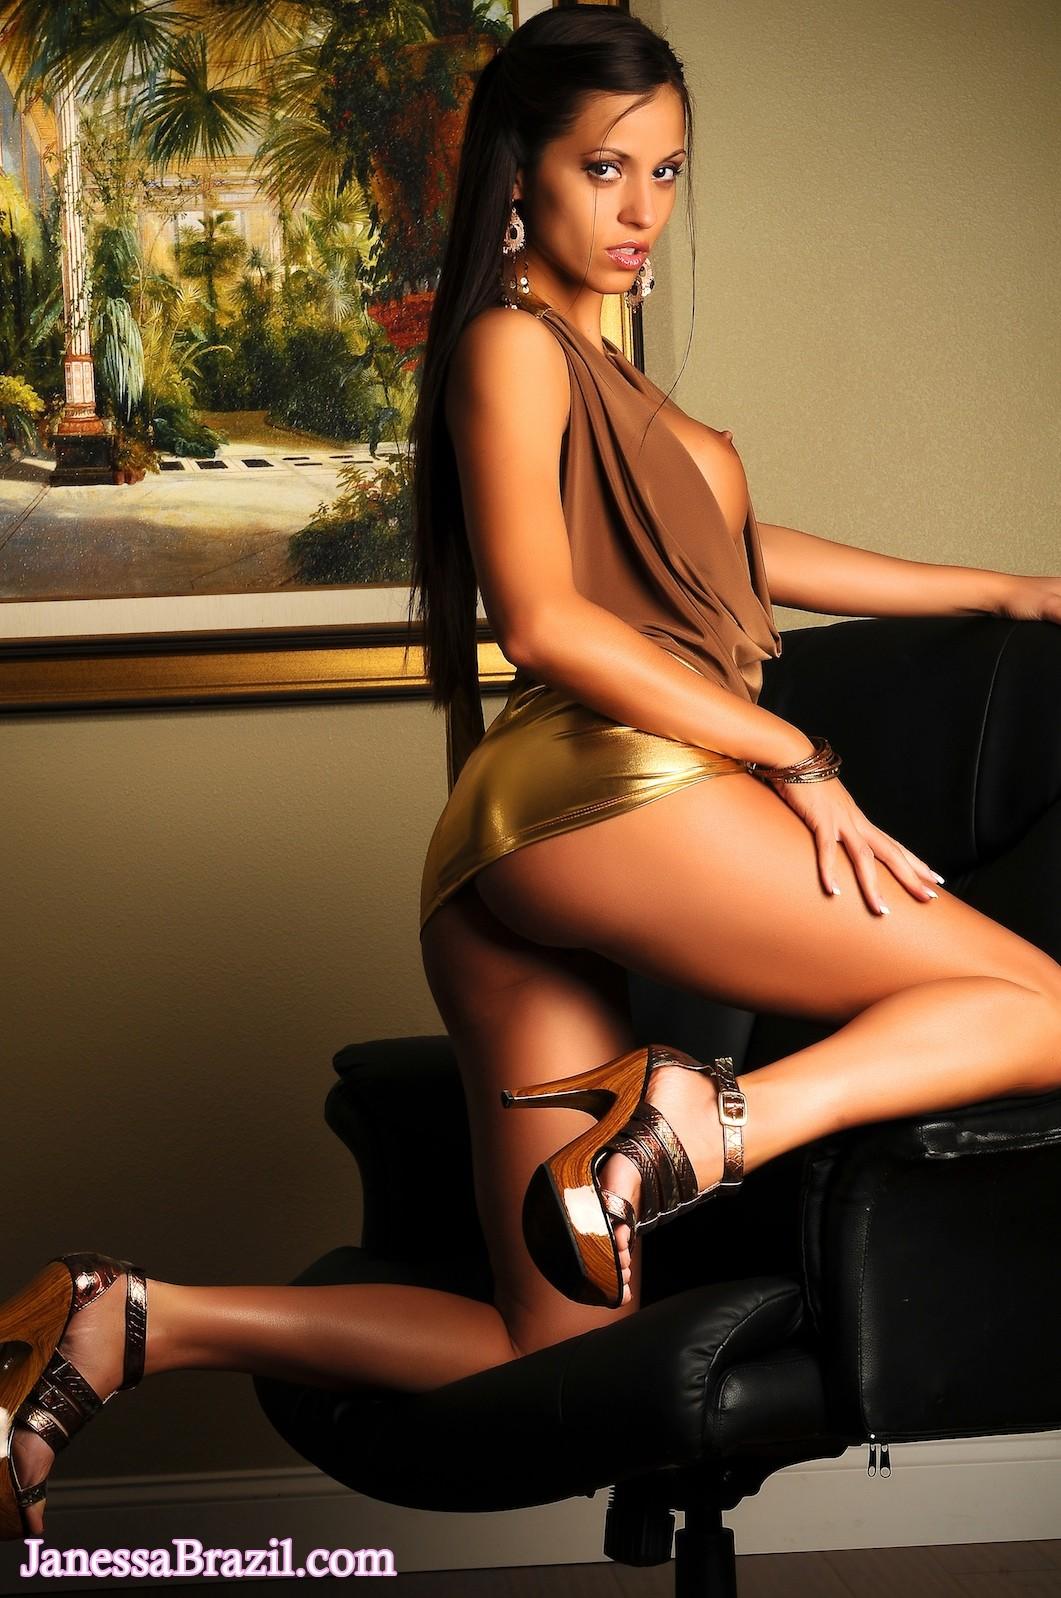 tamil hot nude pics